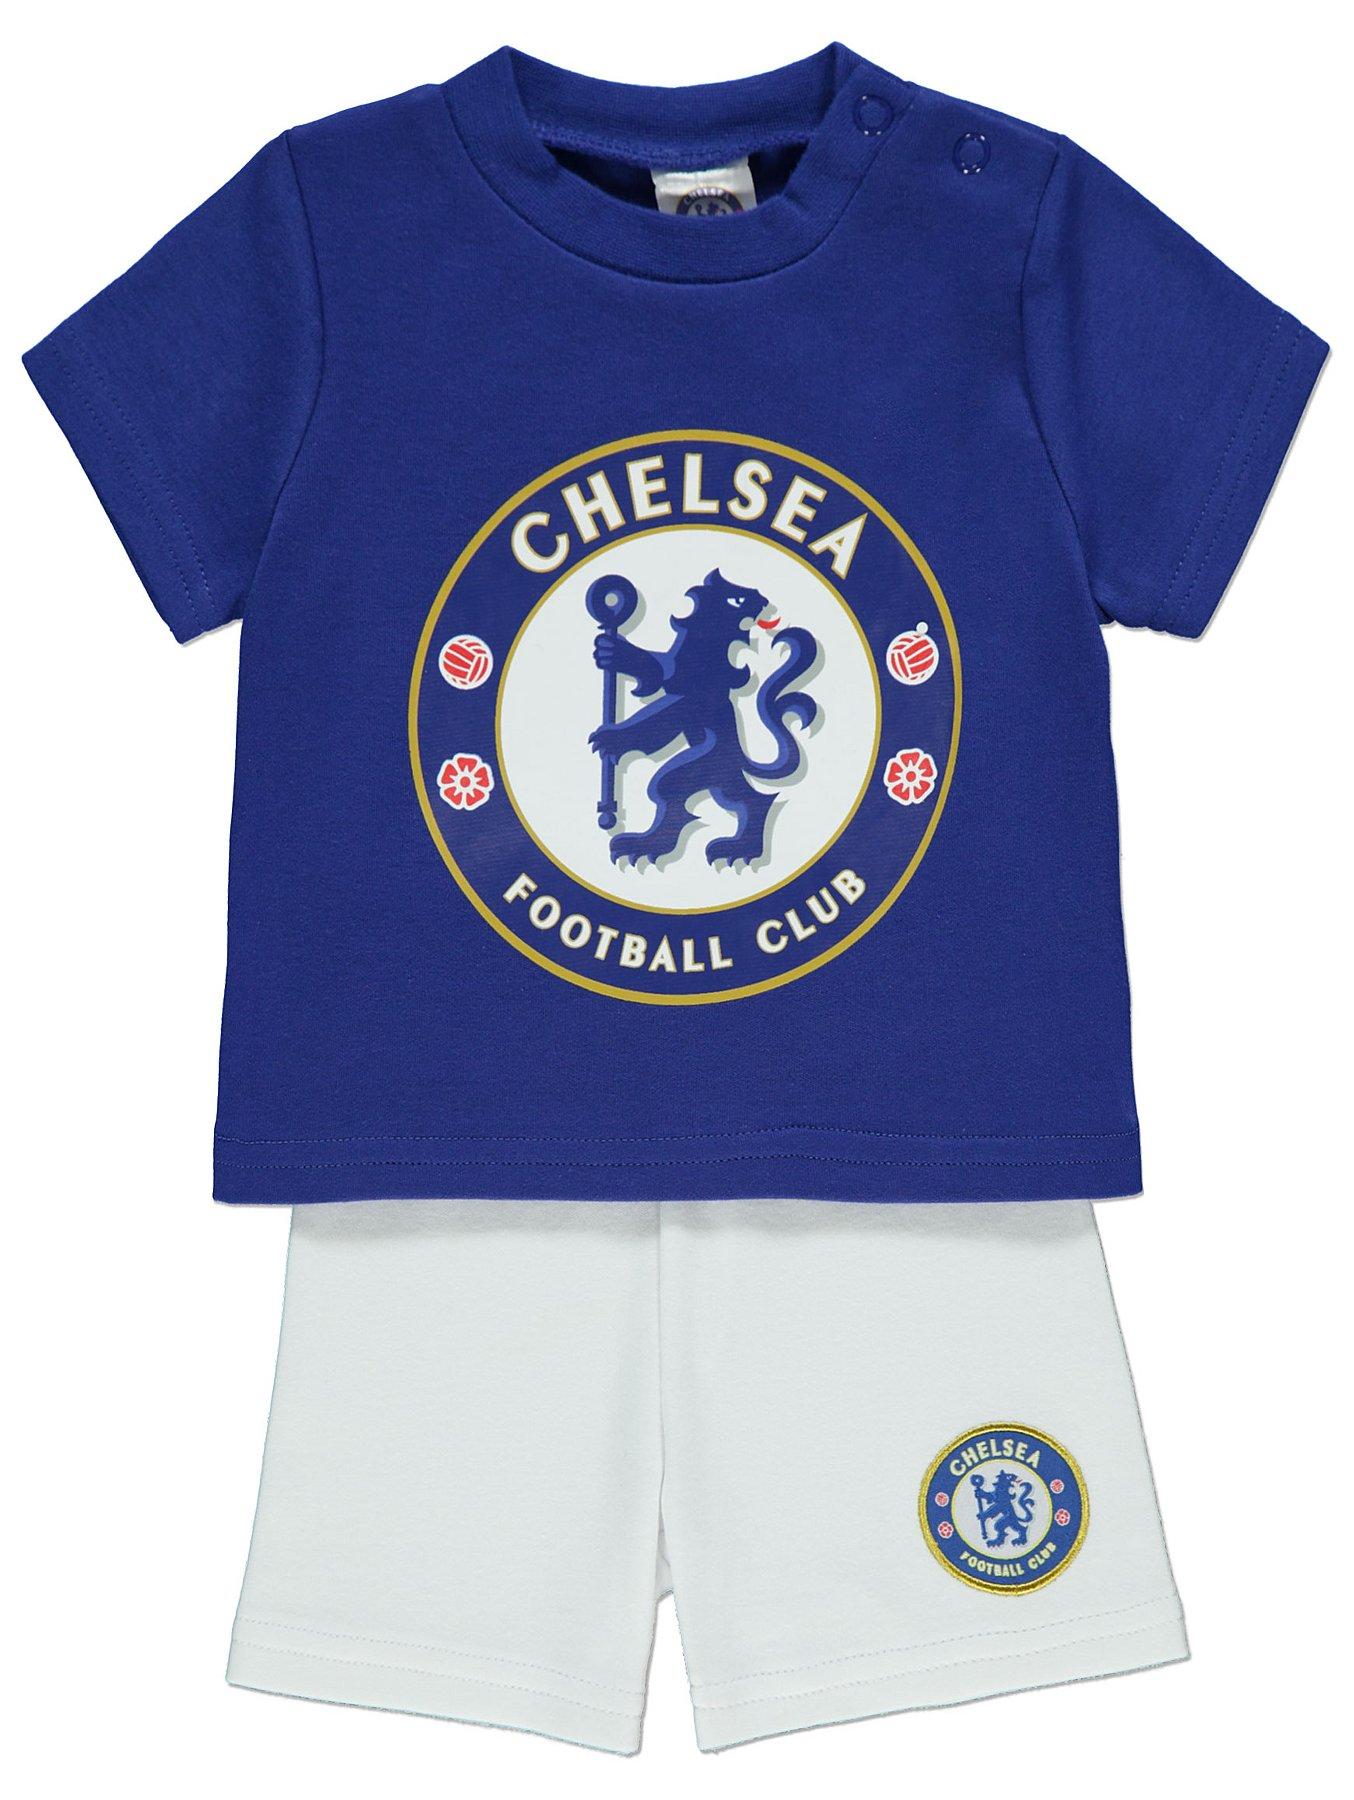 Boys Official Chelsea CFC Football Club The Blues Long Pyjamas 4 to 12 Years